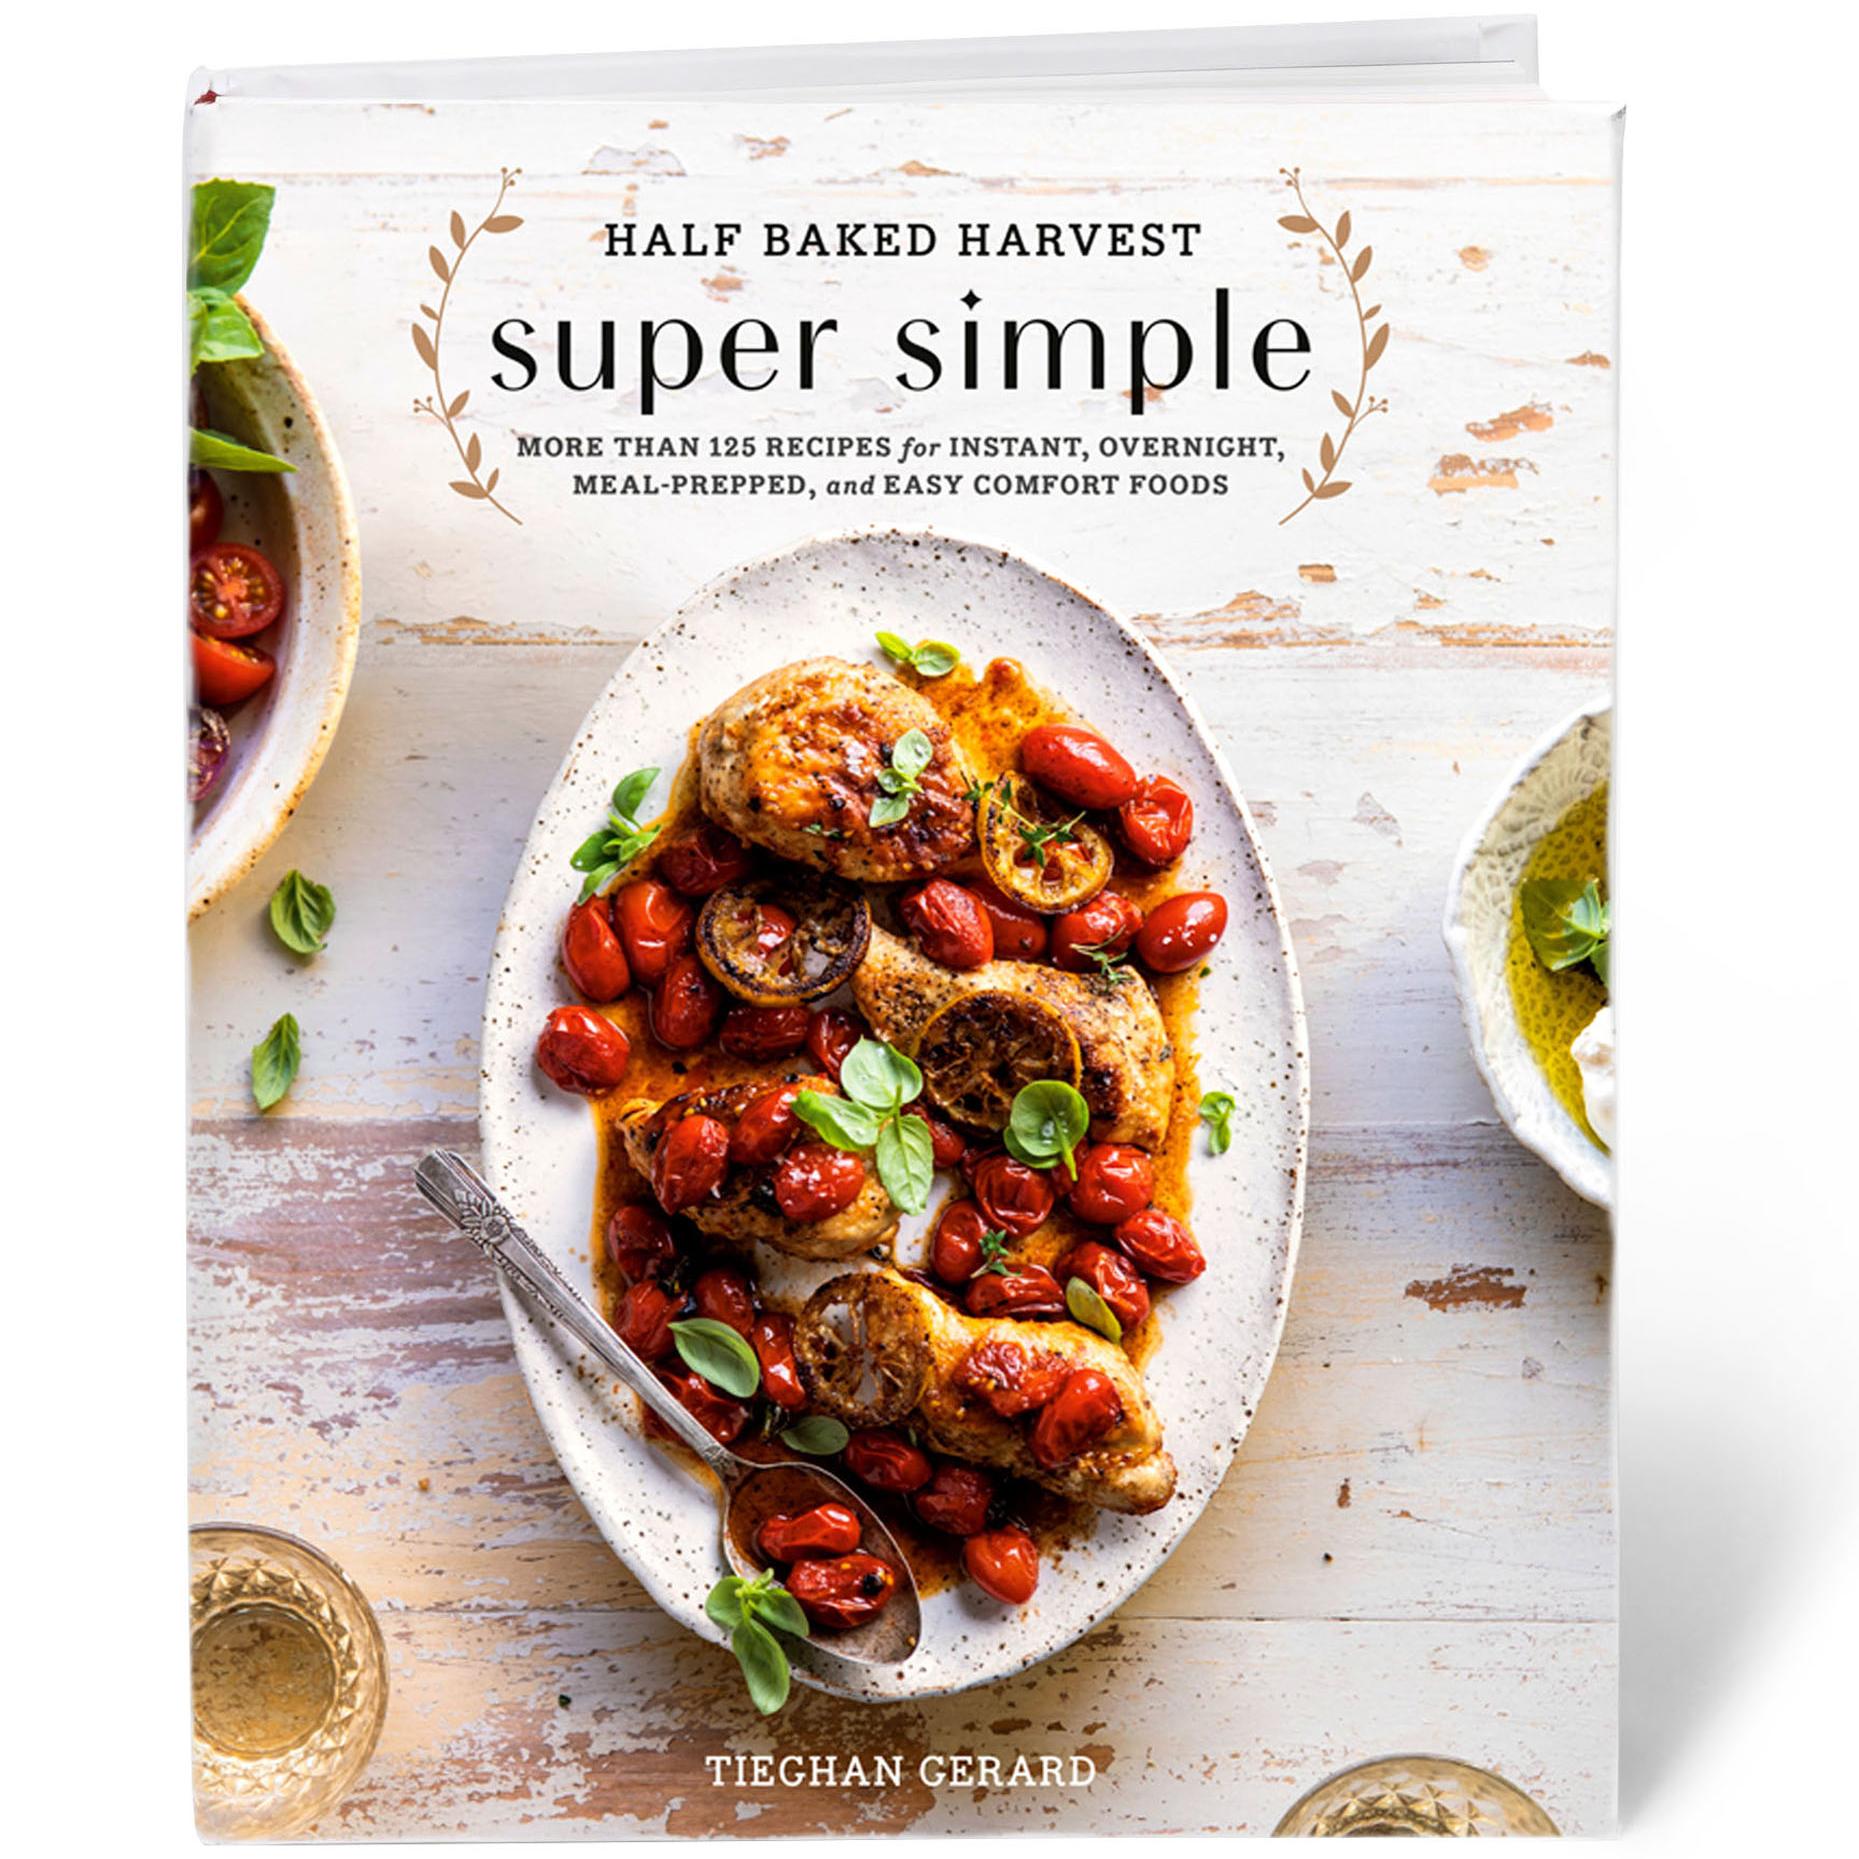 tieghan gerards cookbook half baked harvest super simple